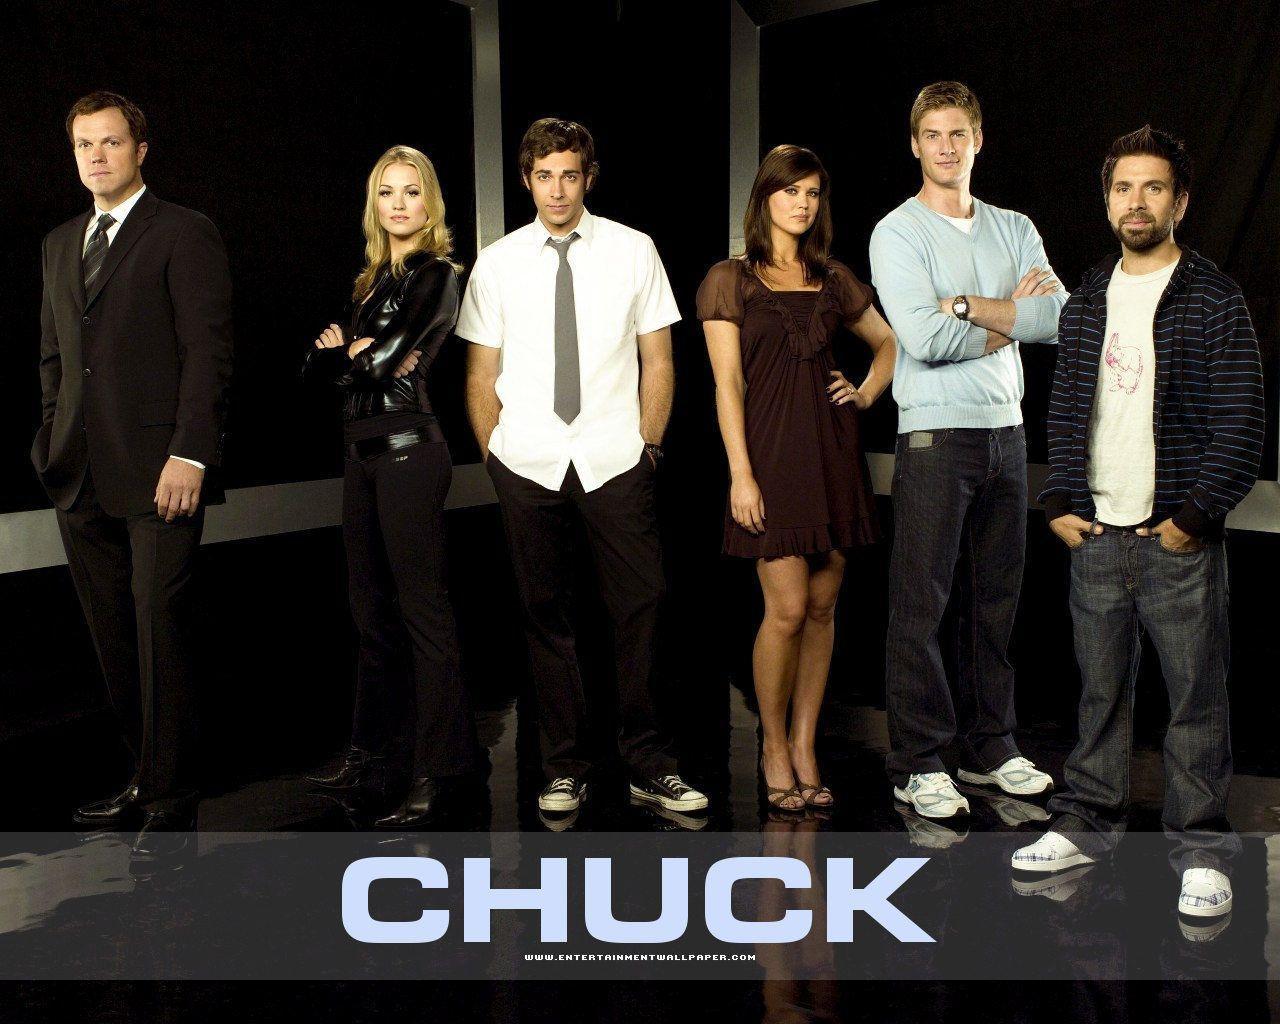 chuck wallpaper - photo #4